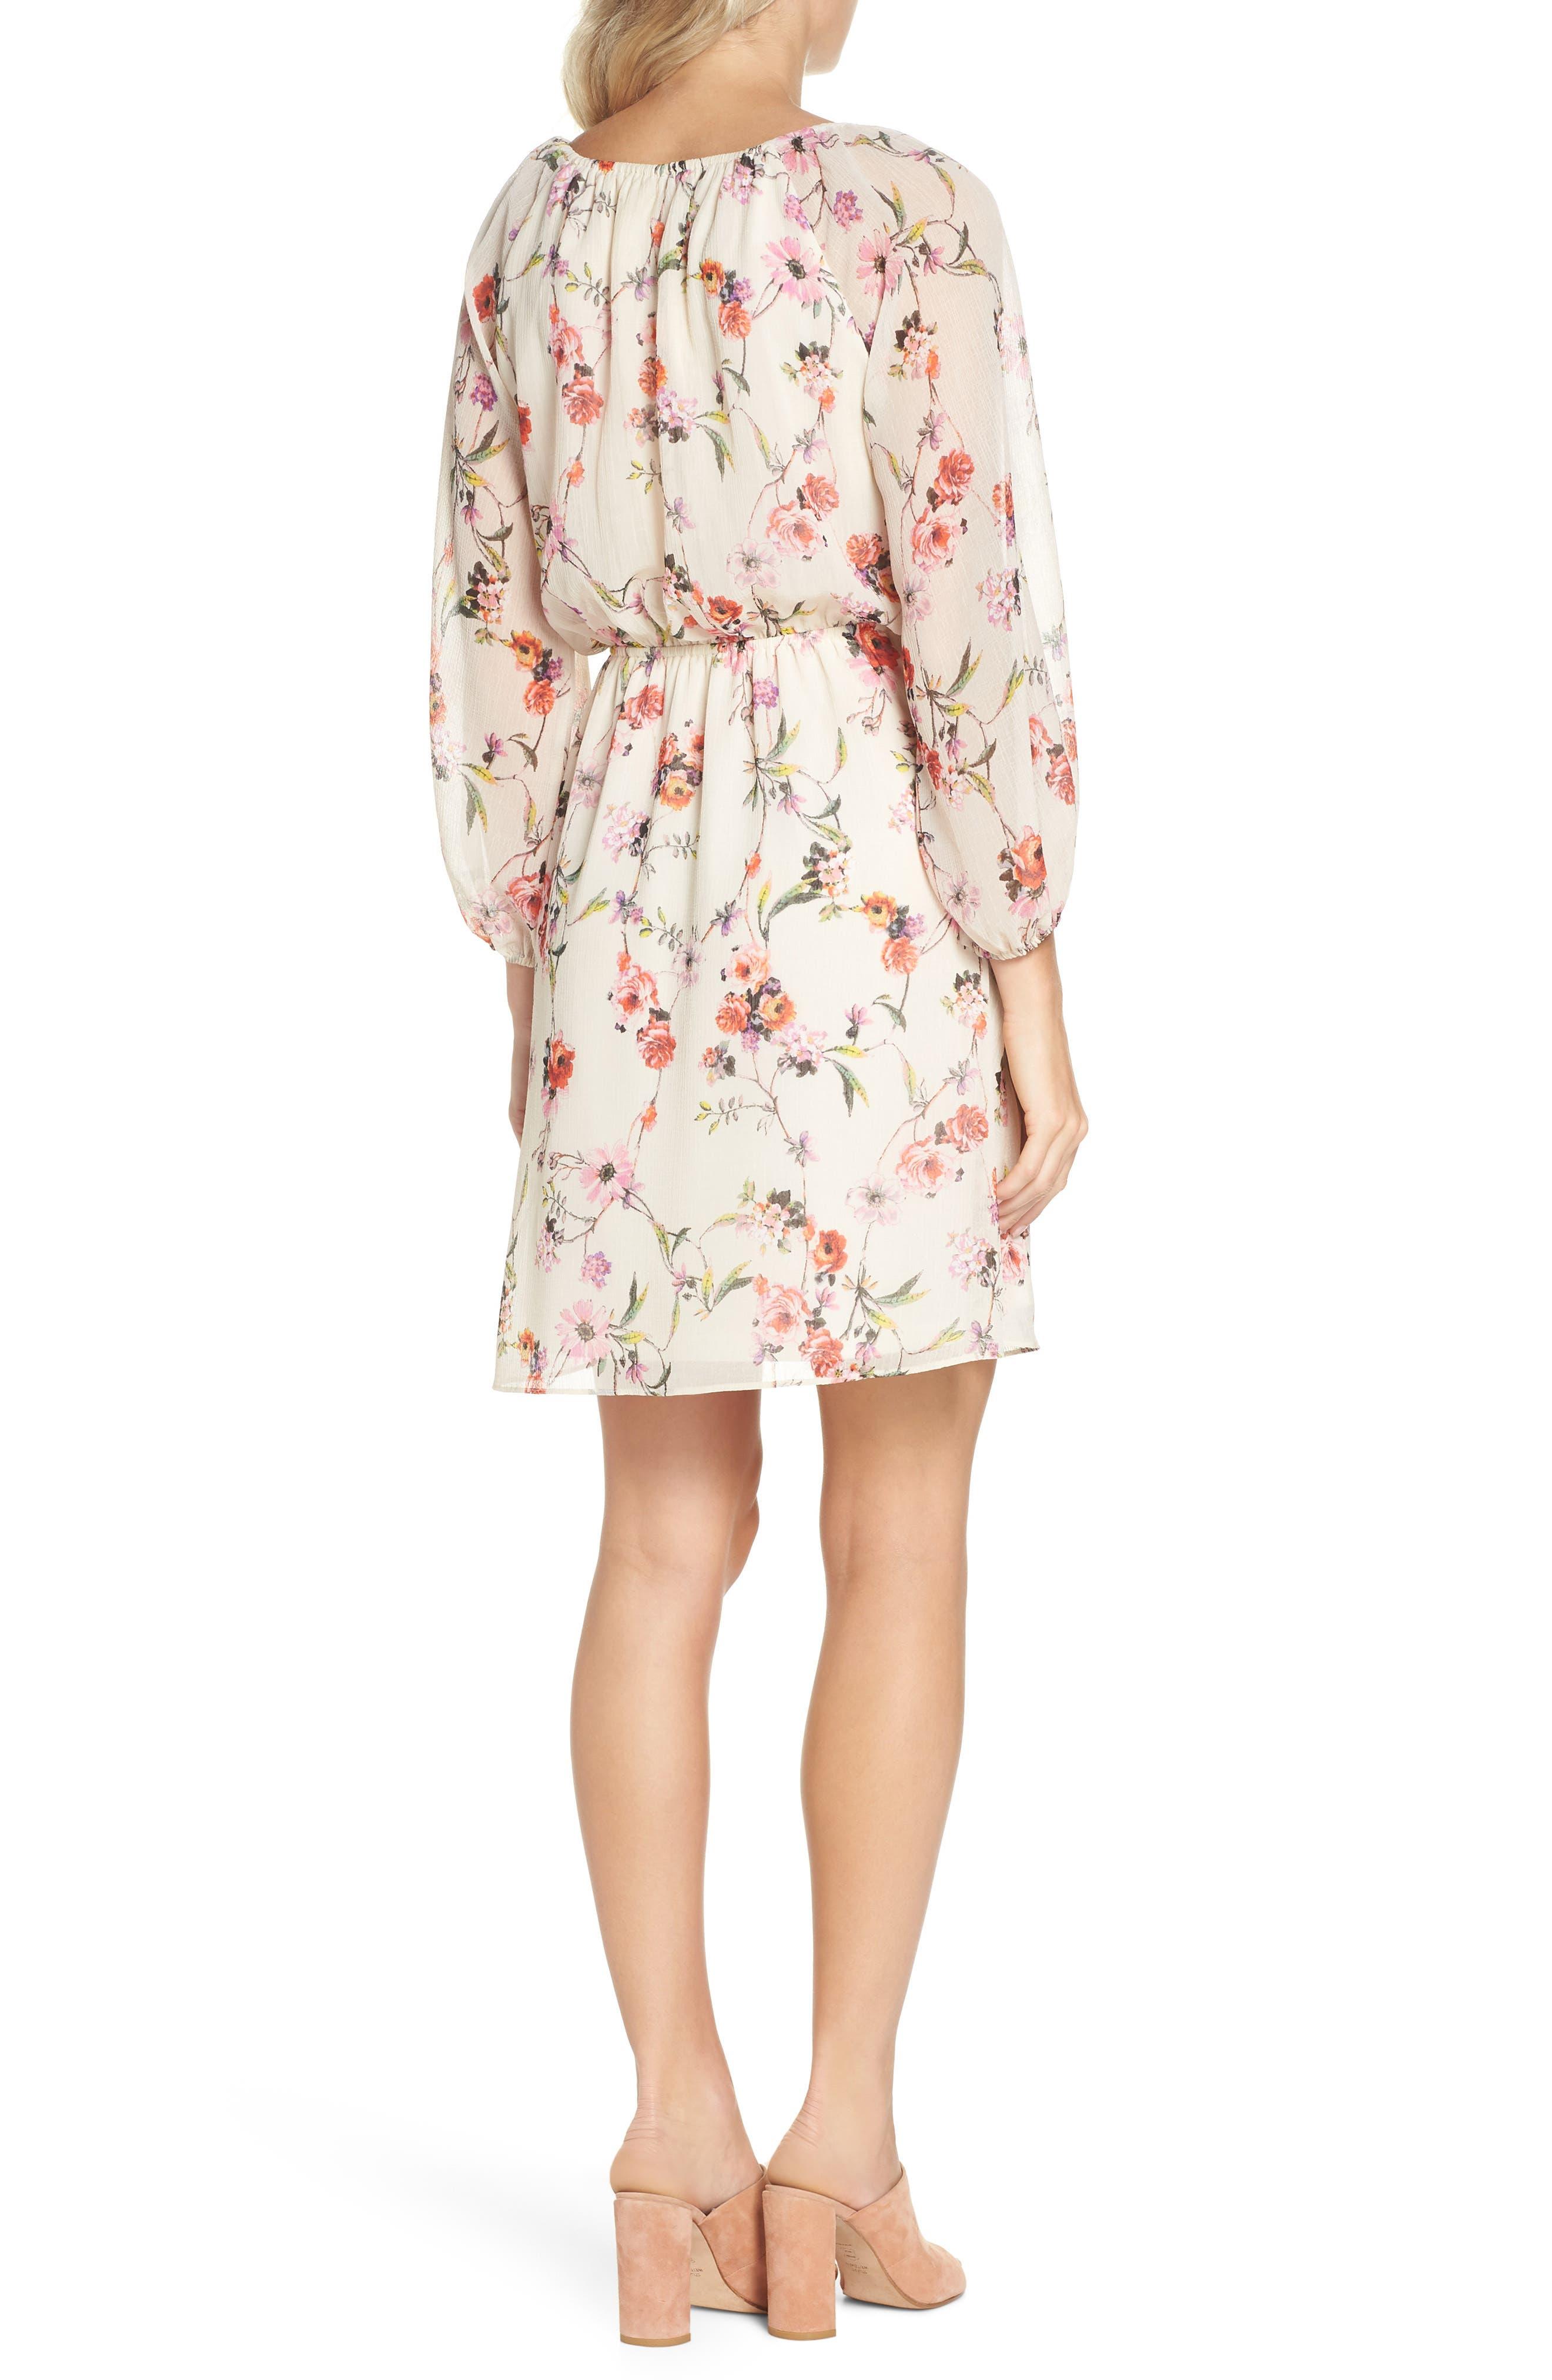 Bonita Oasis Floral Dress,                             Alternate thumbnail 2, color,                             IVORY MULTI